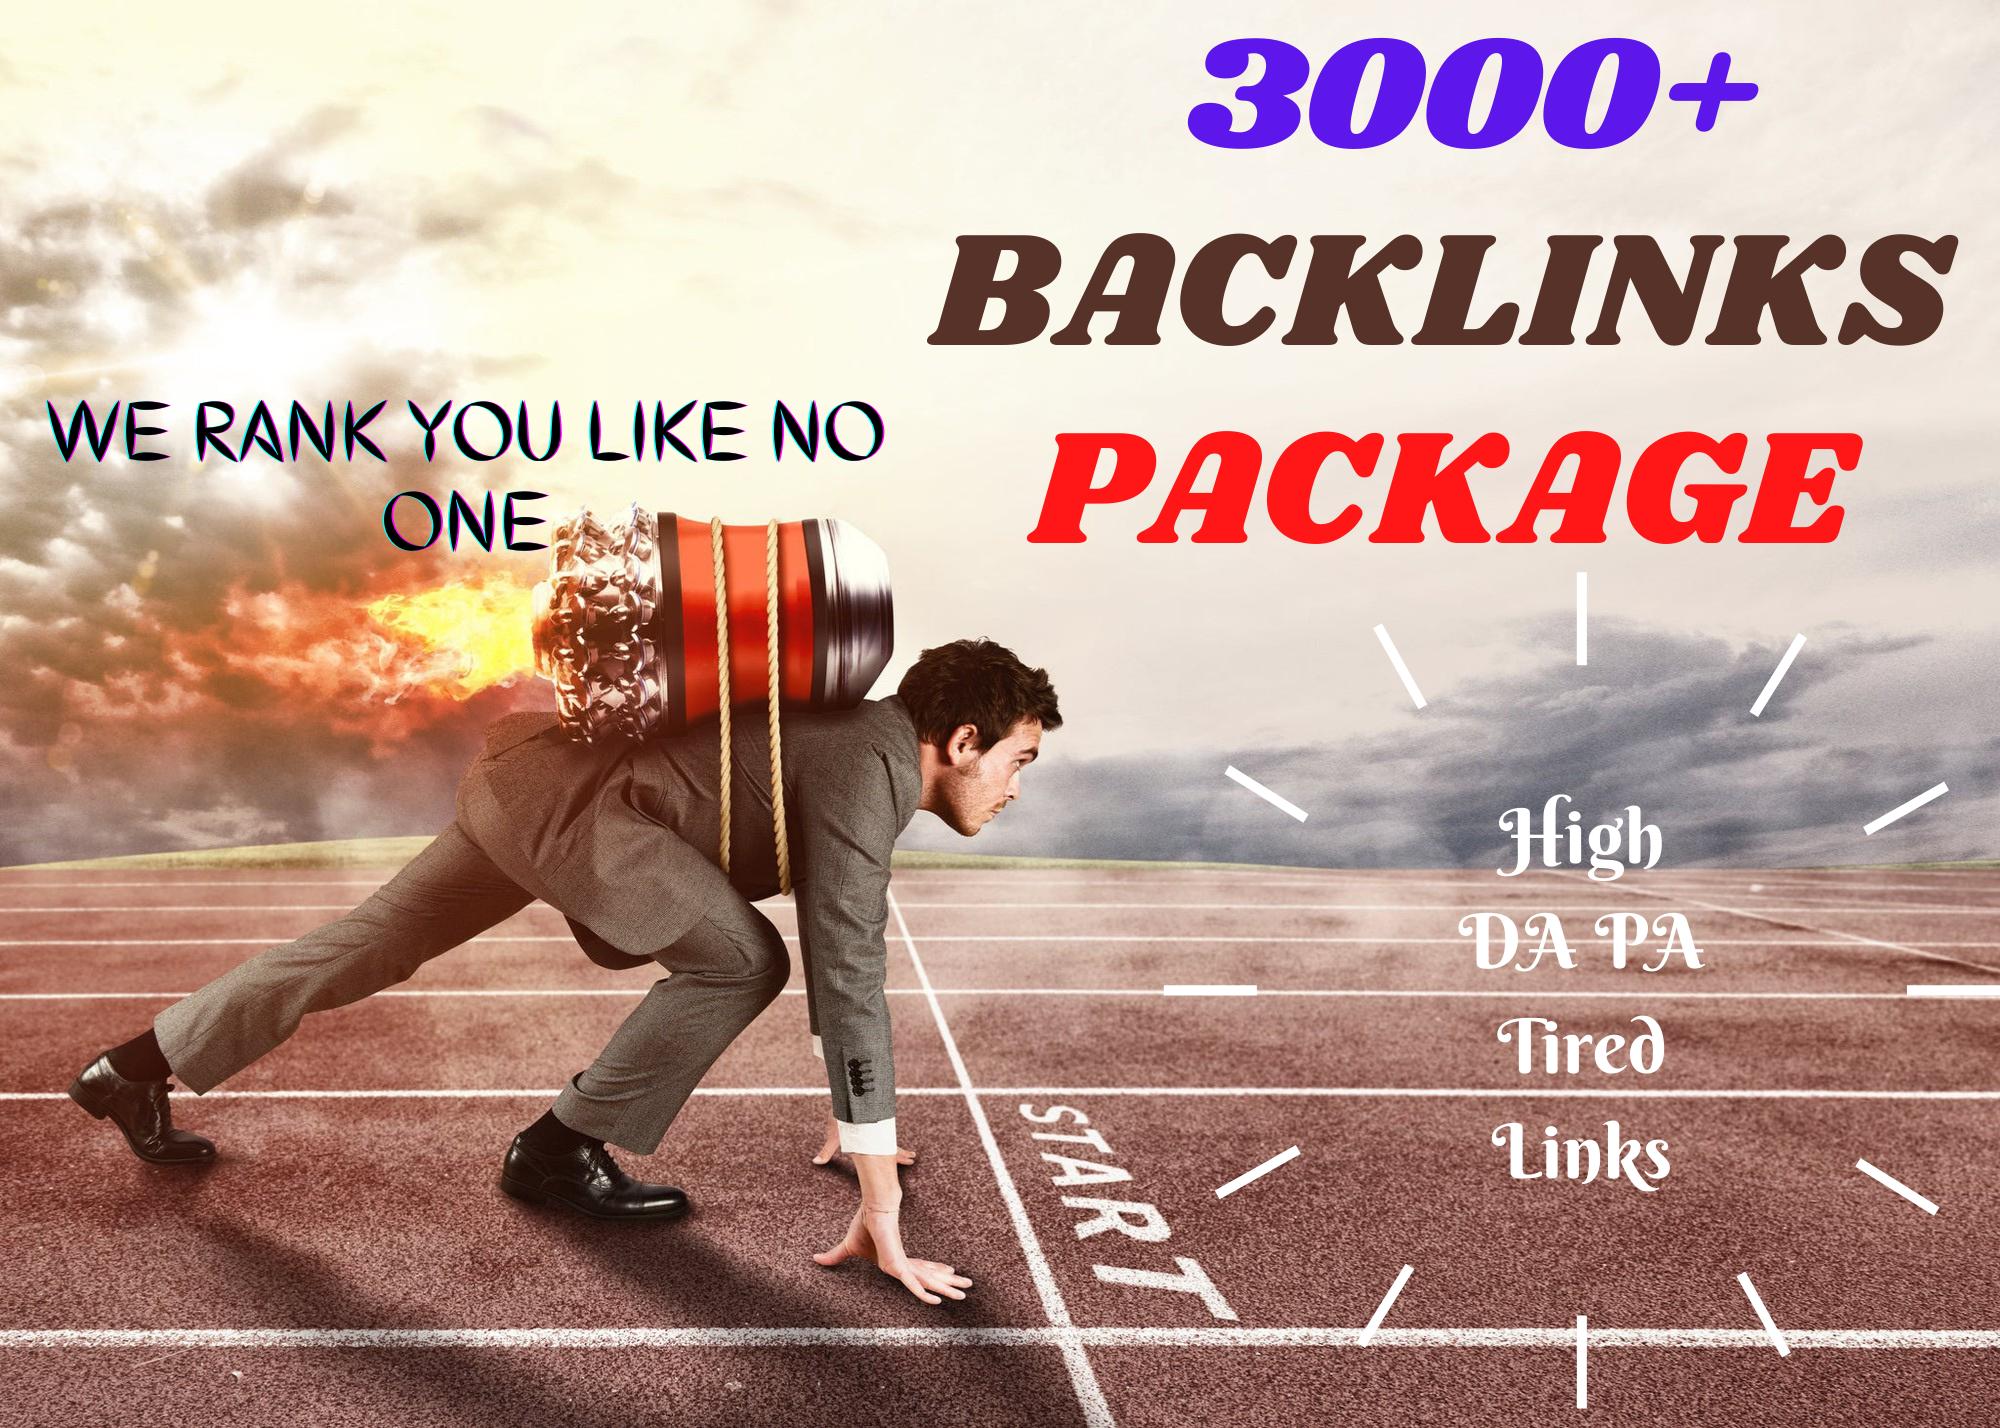 3000 High DA PA Tired LInk Backlinks to Skyrocket Your Ranking On Google